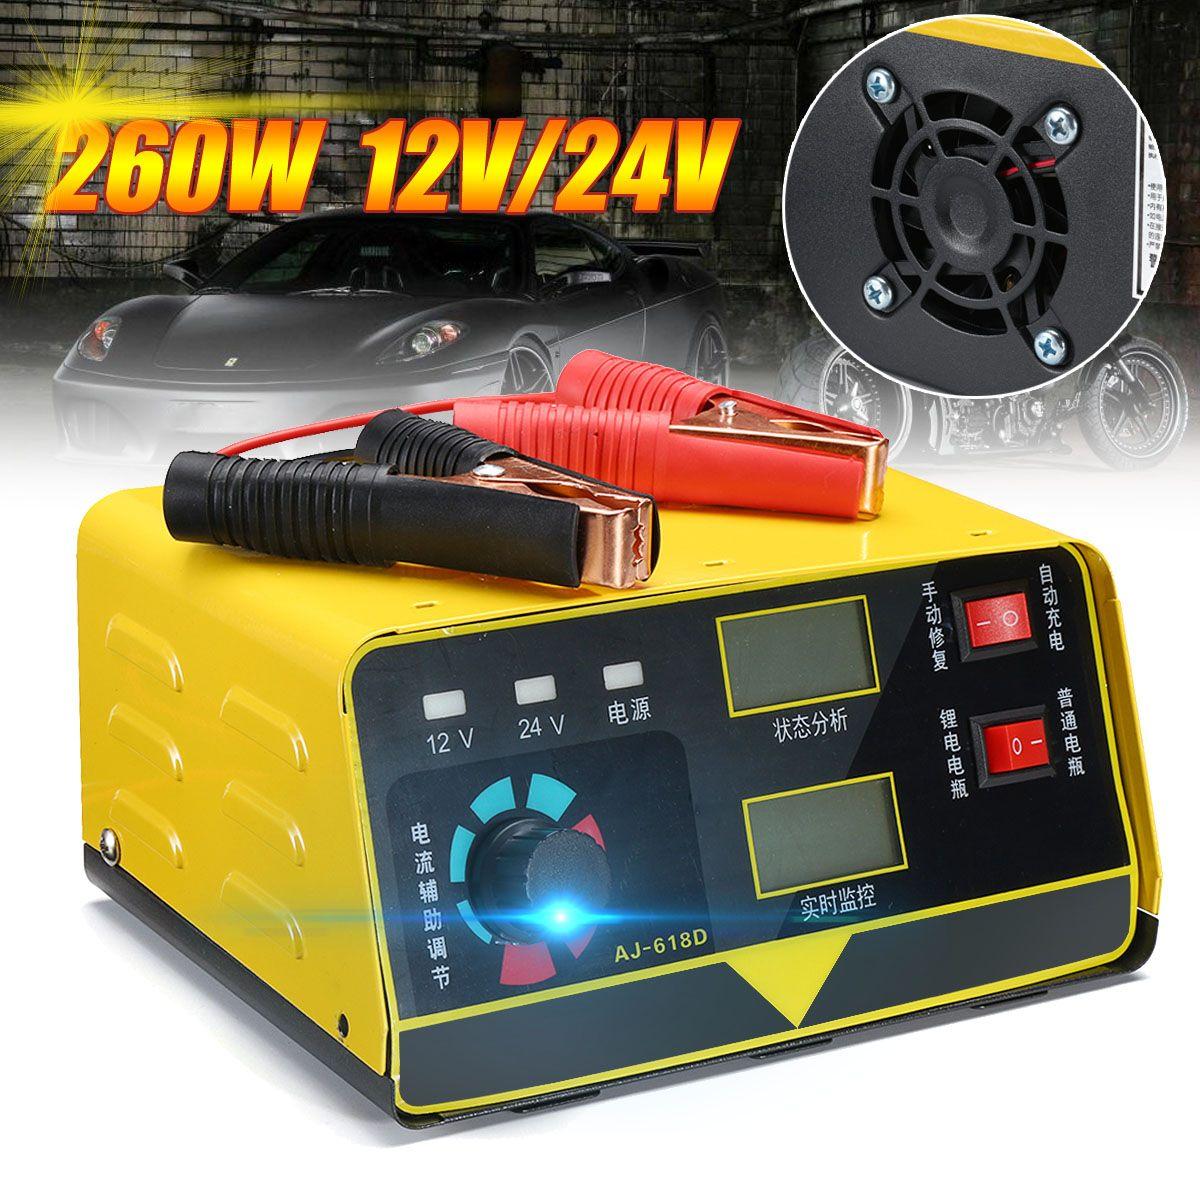 Auto Batterie Ladegerät 12 V 24 V Voll Automatische Motorrad Elektrische 400AH Auto Batterie Ladegerät Geräuscharm + Adapter